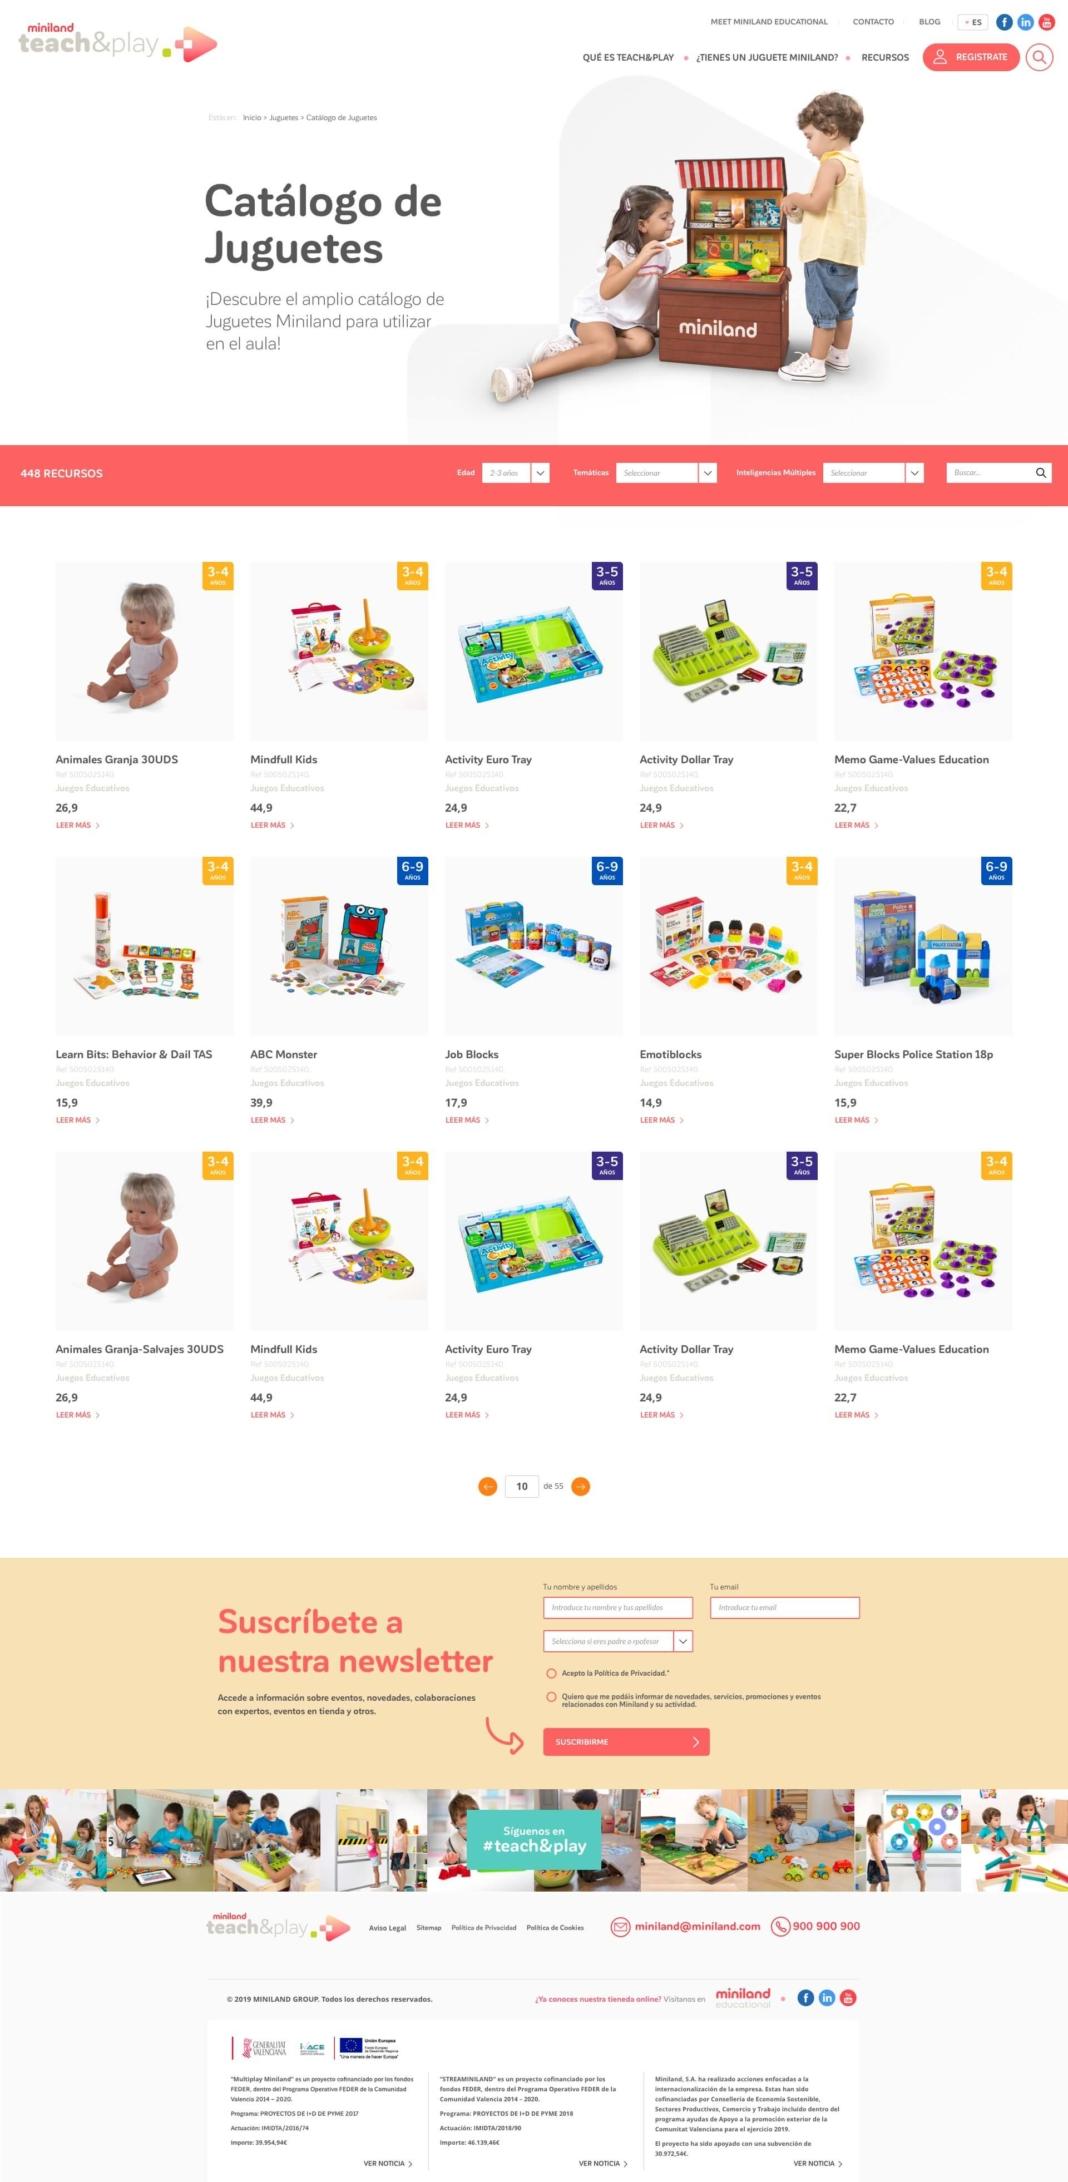 Diseño Miniland teach&play listado de juguetes